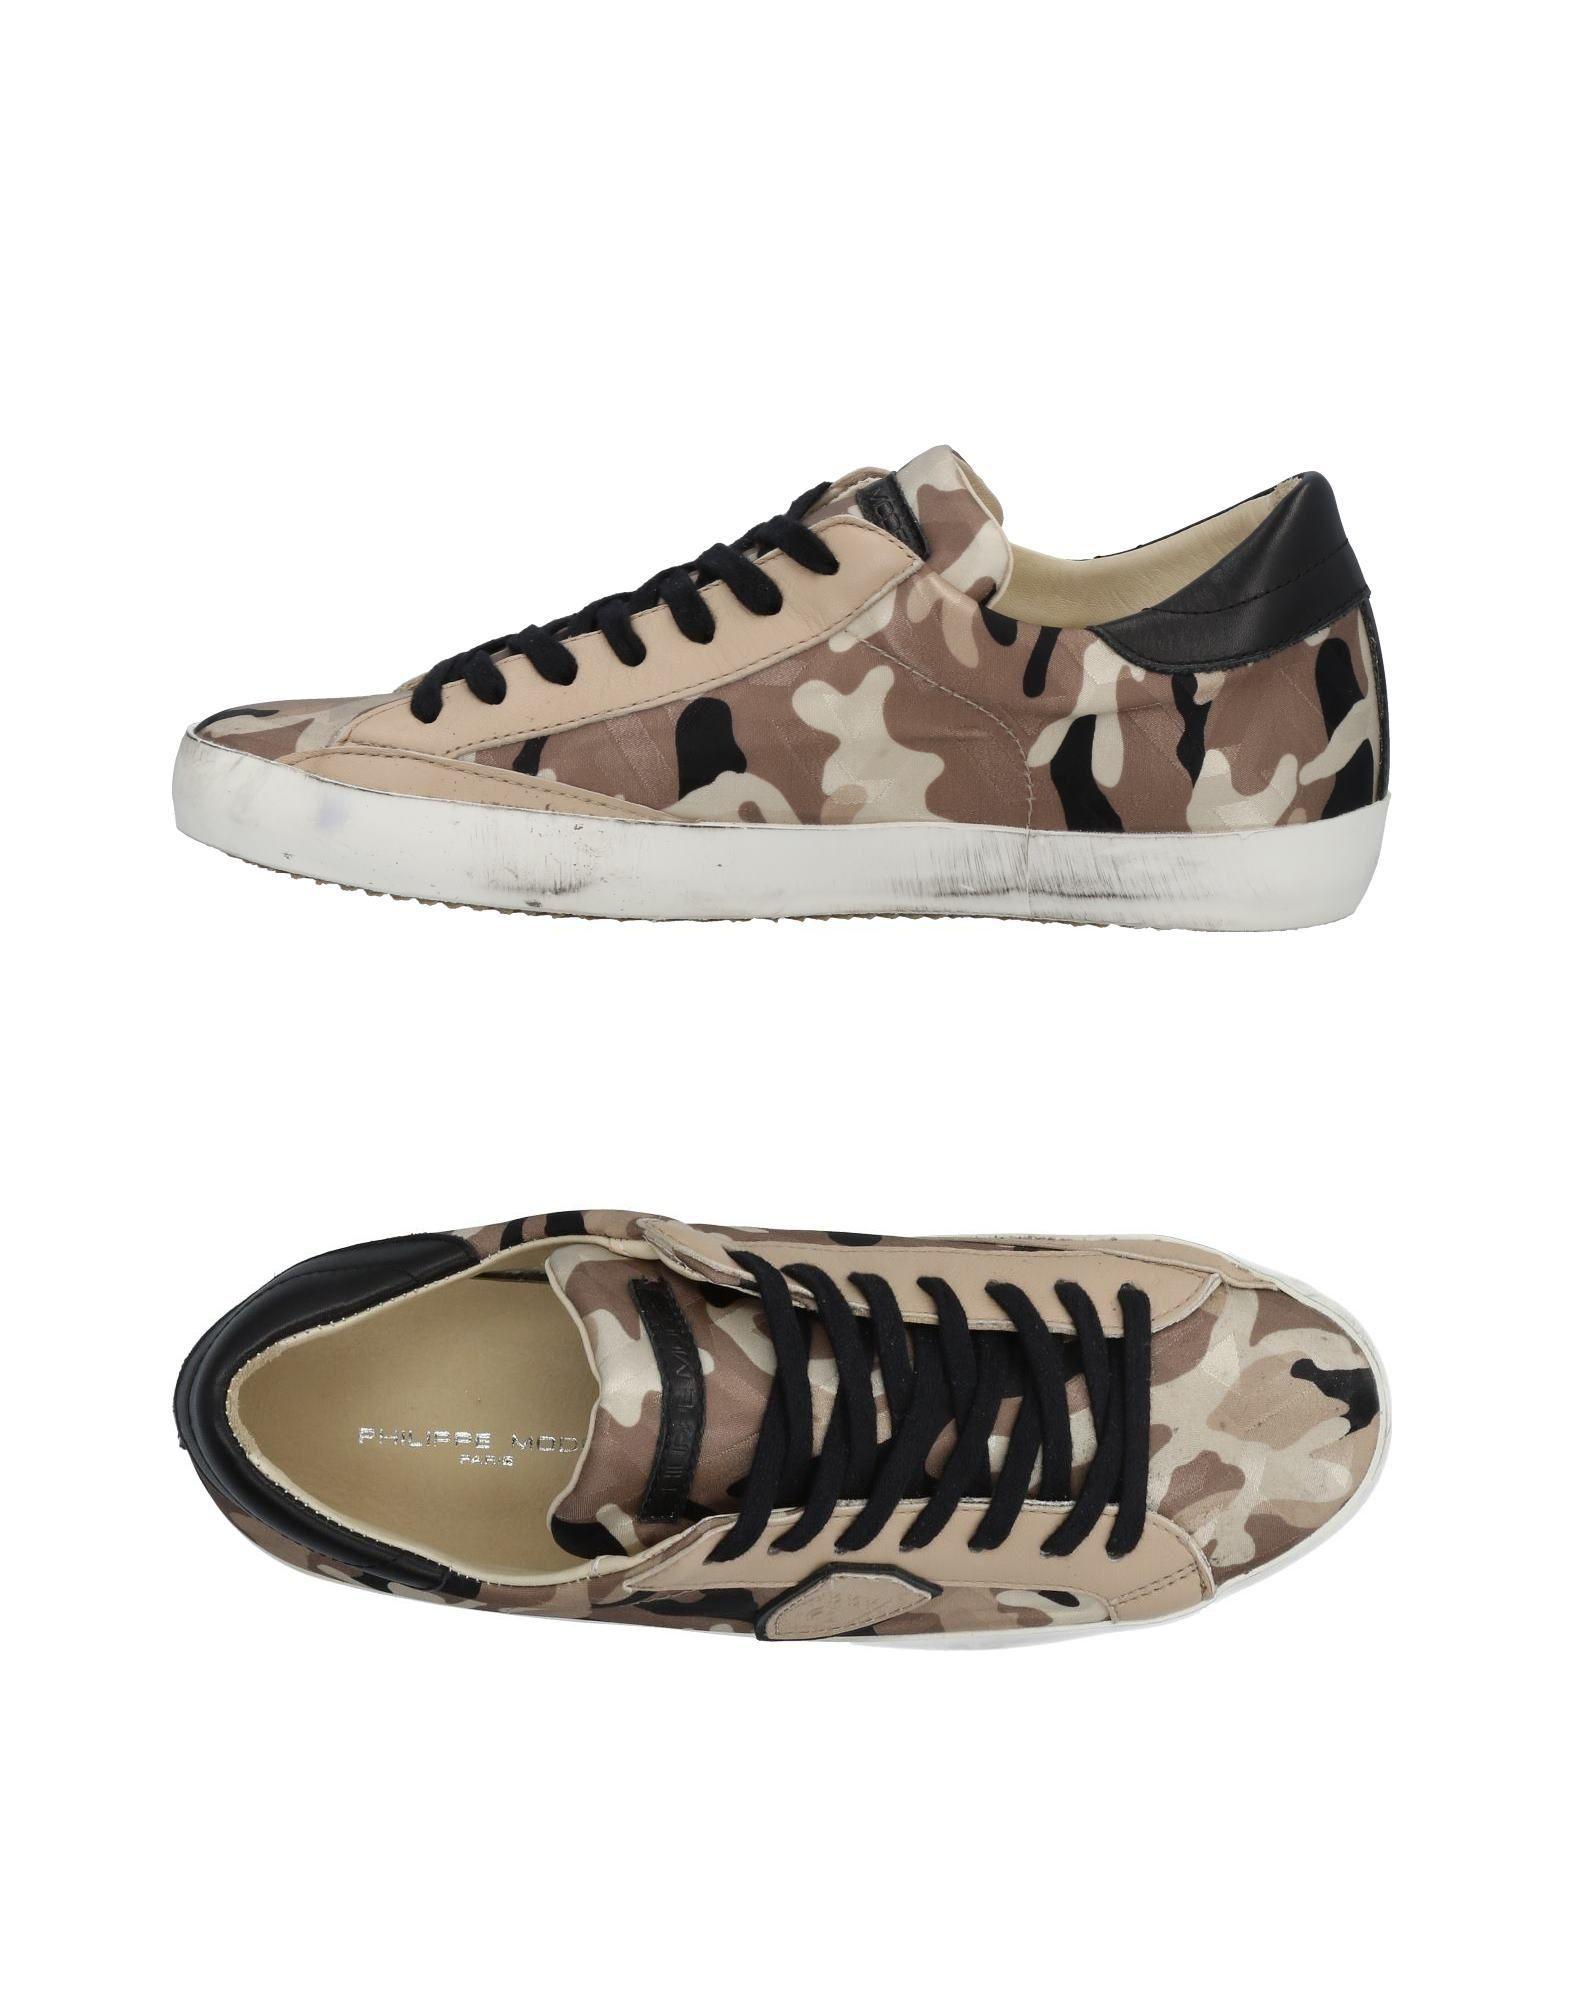 Philippe Model Sneakers Sneakers - Men Philippe Model Sneakers Sneakers online on  United Kingdom - 11480699WS fed905